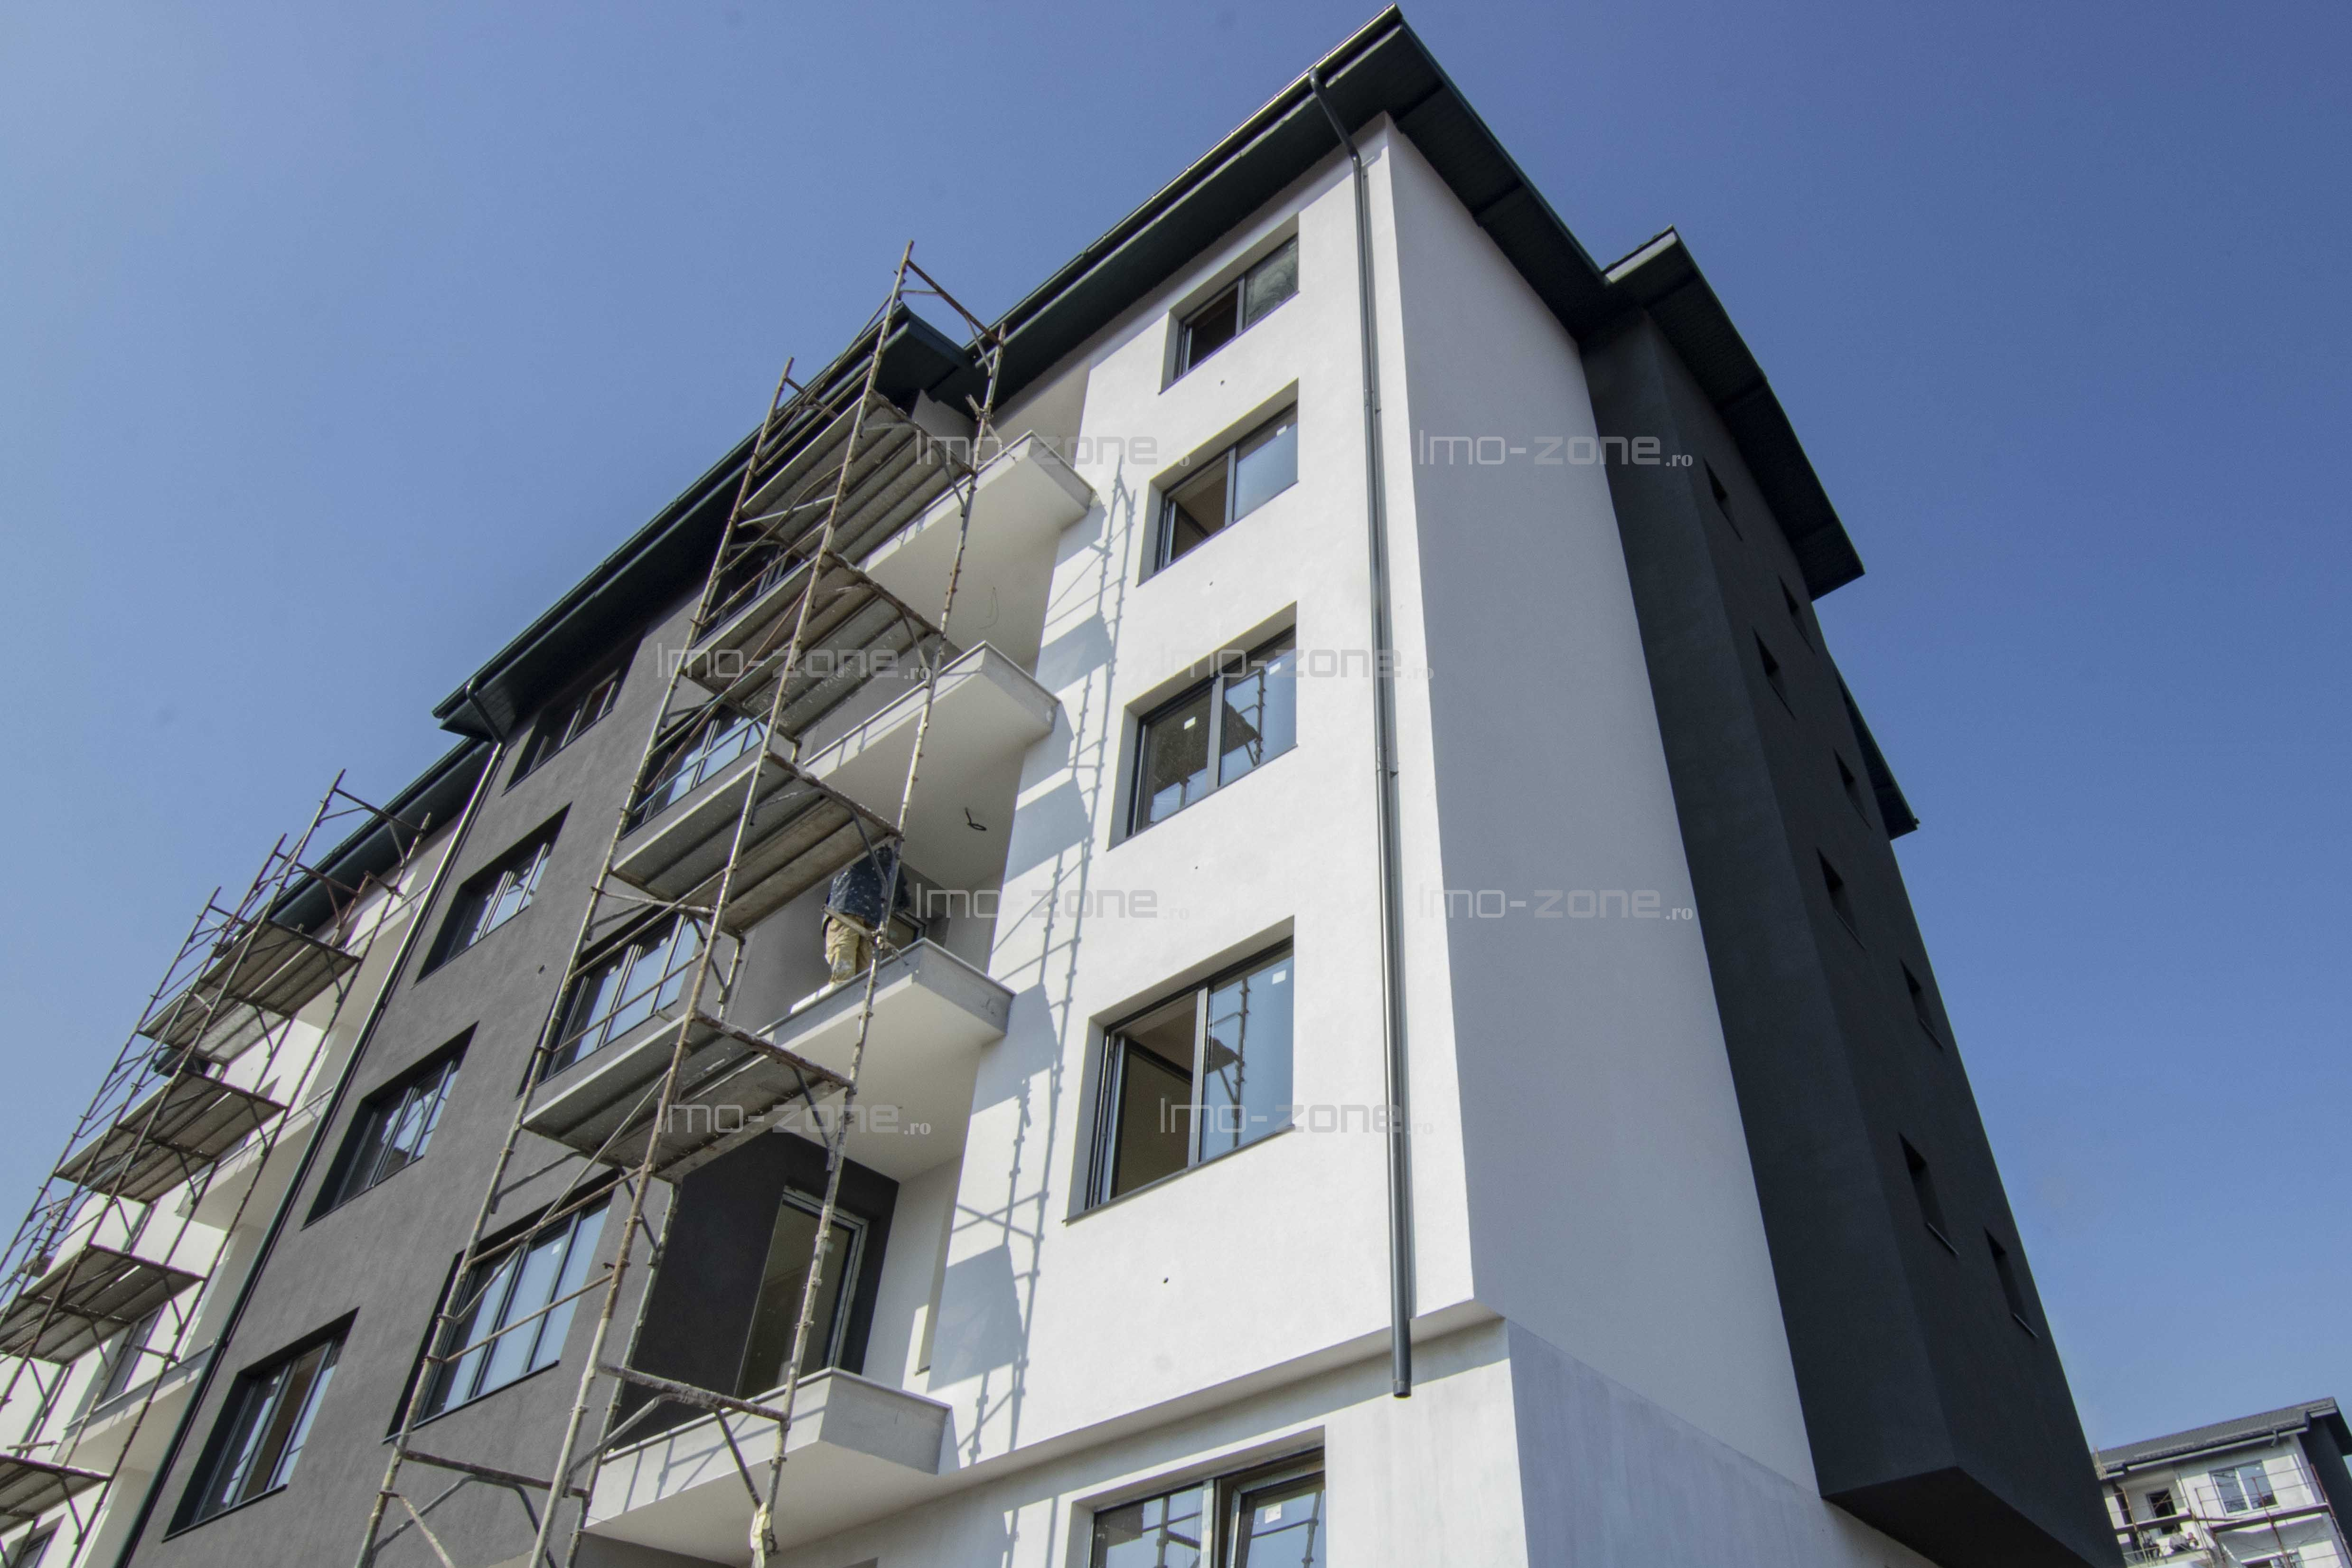 COMISION 0% - Apartament cu 2 CAMERE modern, FINISAT ASA CUM VA PLACE